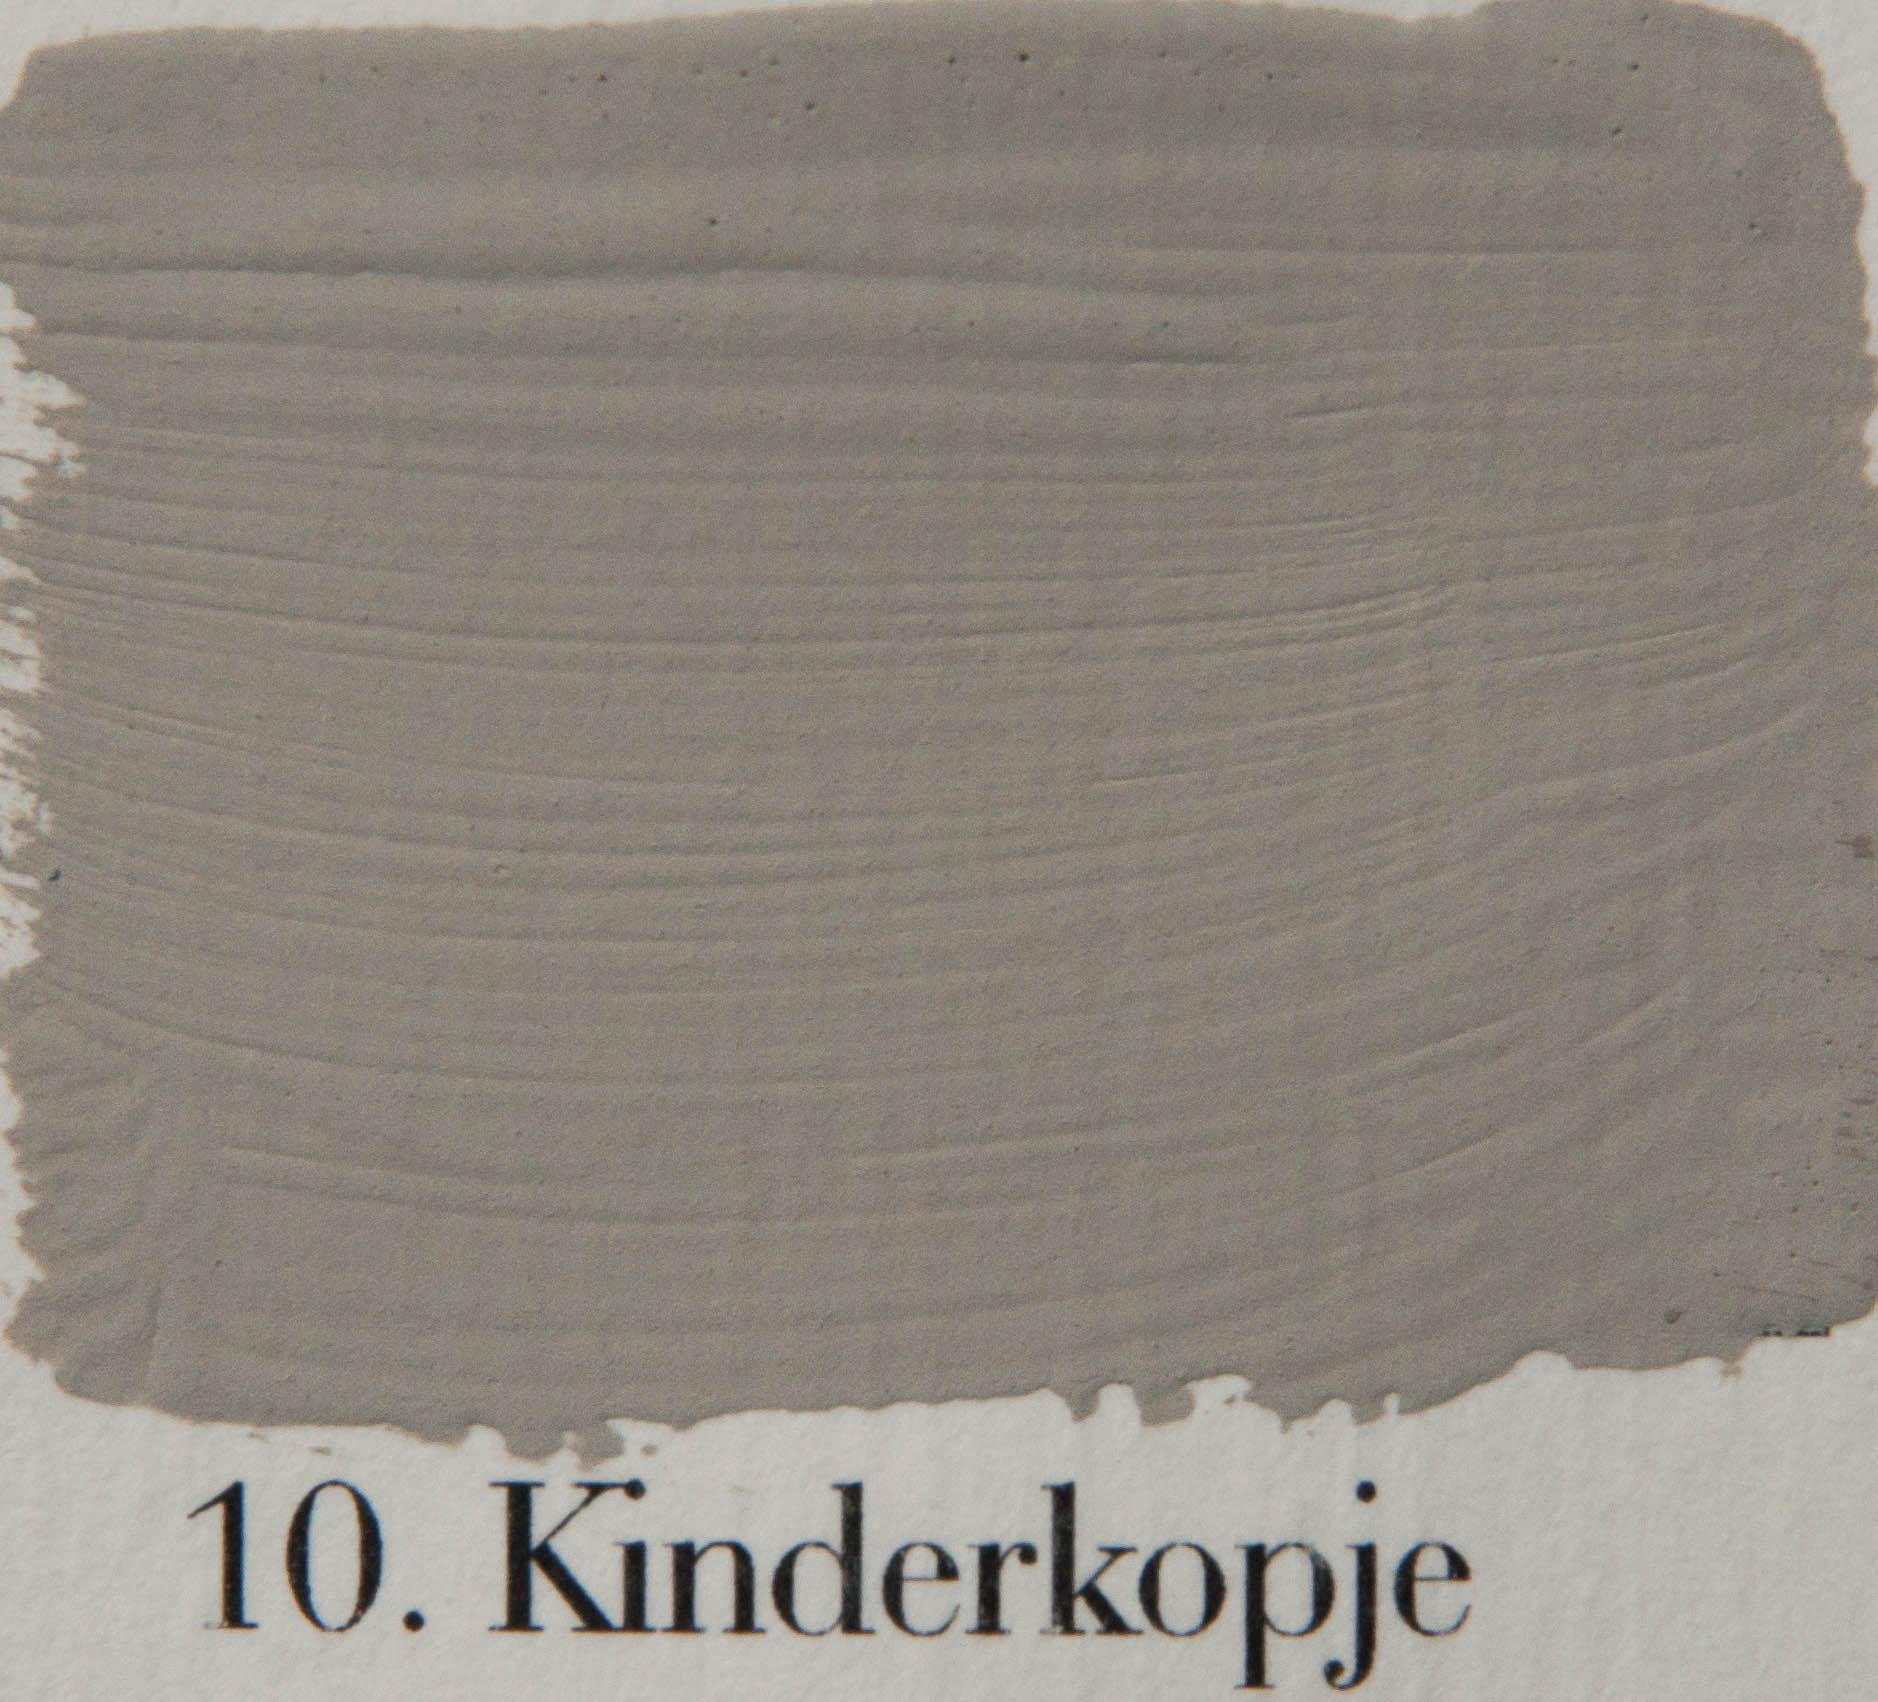 'l Authentique krijtverf 10. Kinderkopje